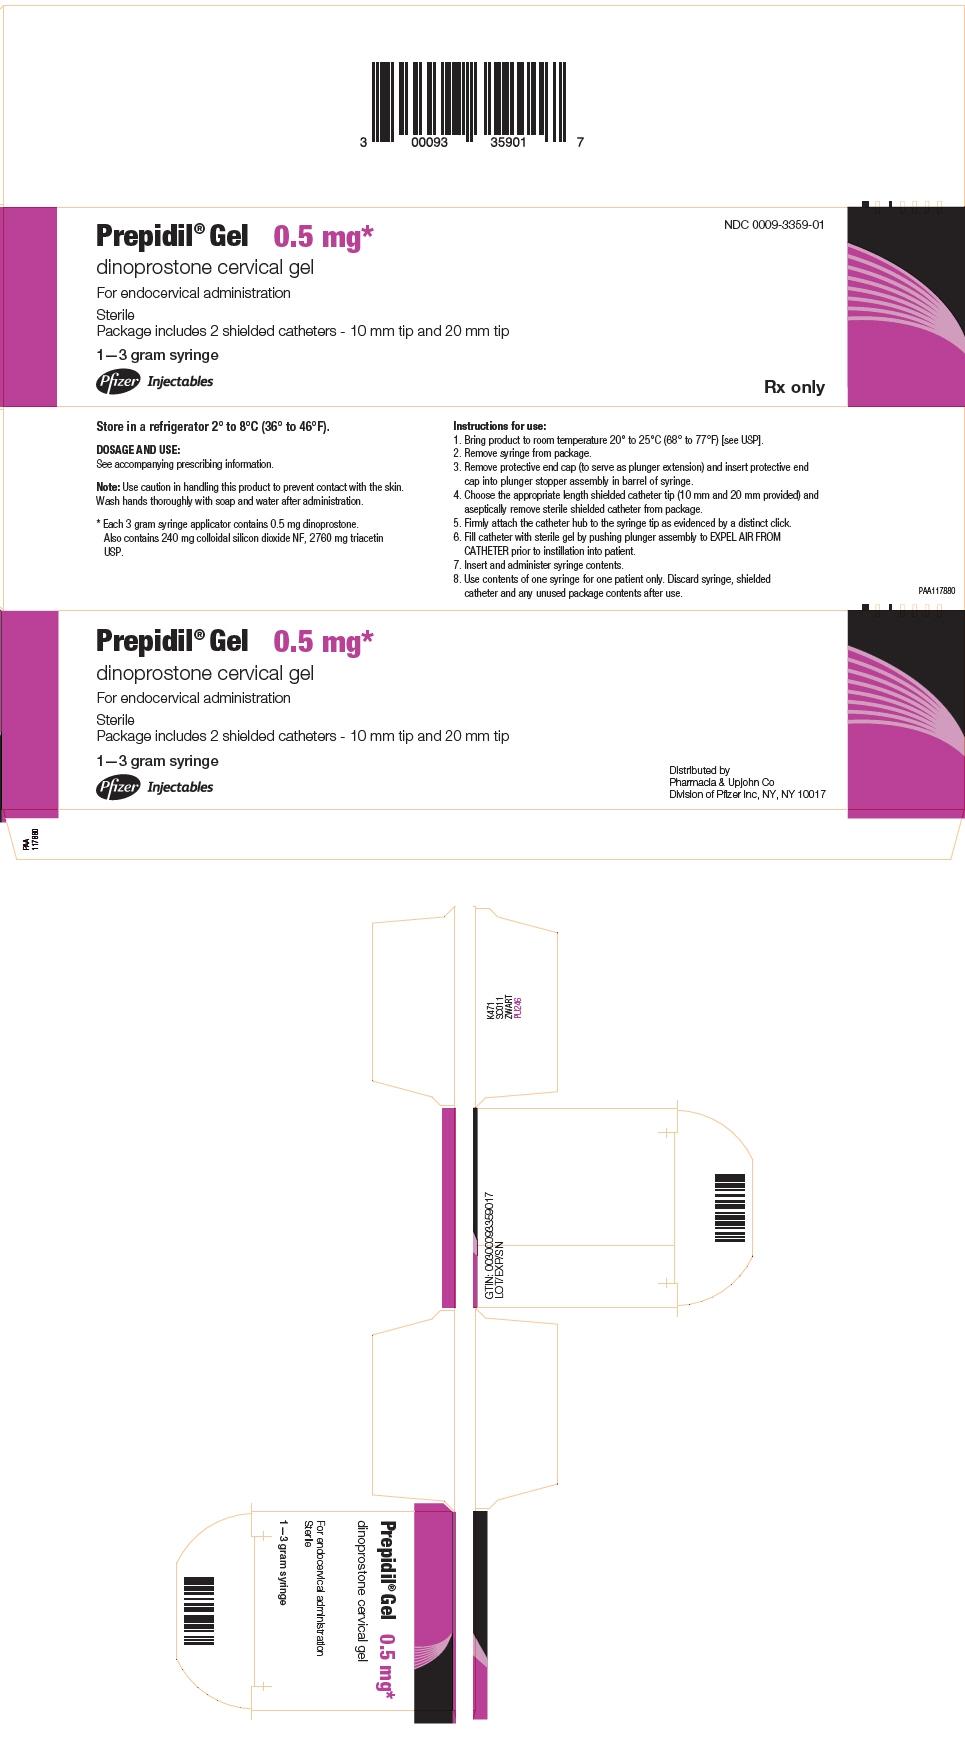 PRINCIPAL DISPLAY PANEL - 3 gram Syringe Carton